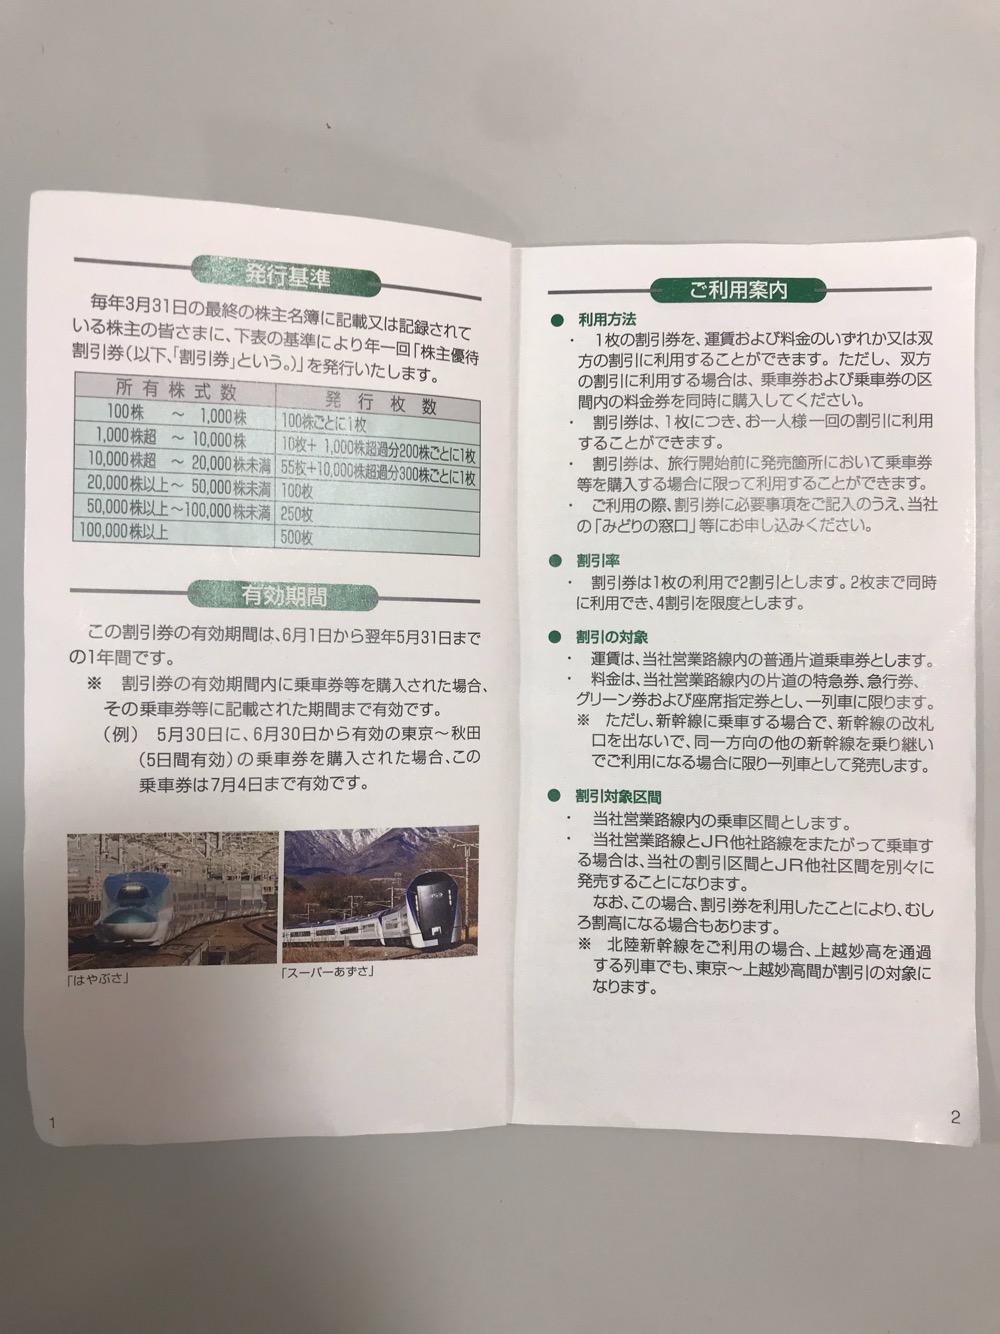 JR東日本株主優待割引券 有効期間2018年6月1日から2019年5月31日 - 発行基準、有効期間、ご利用案内